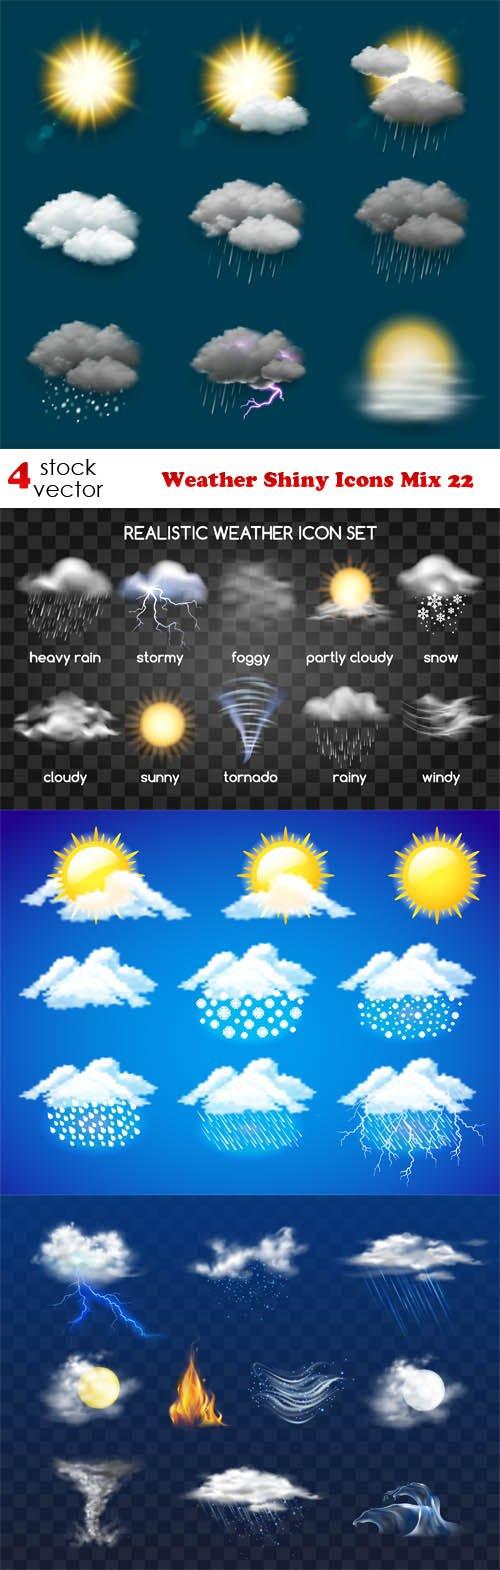 Vectors - Weather Shiny Icons Mix 22